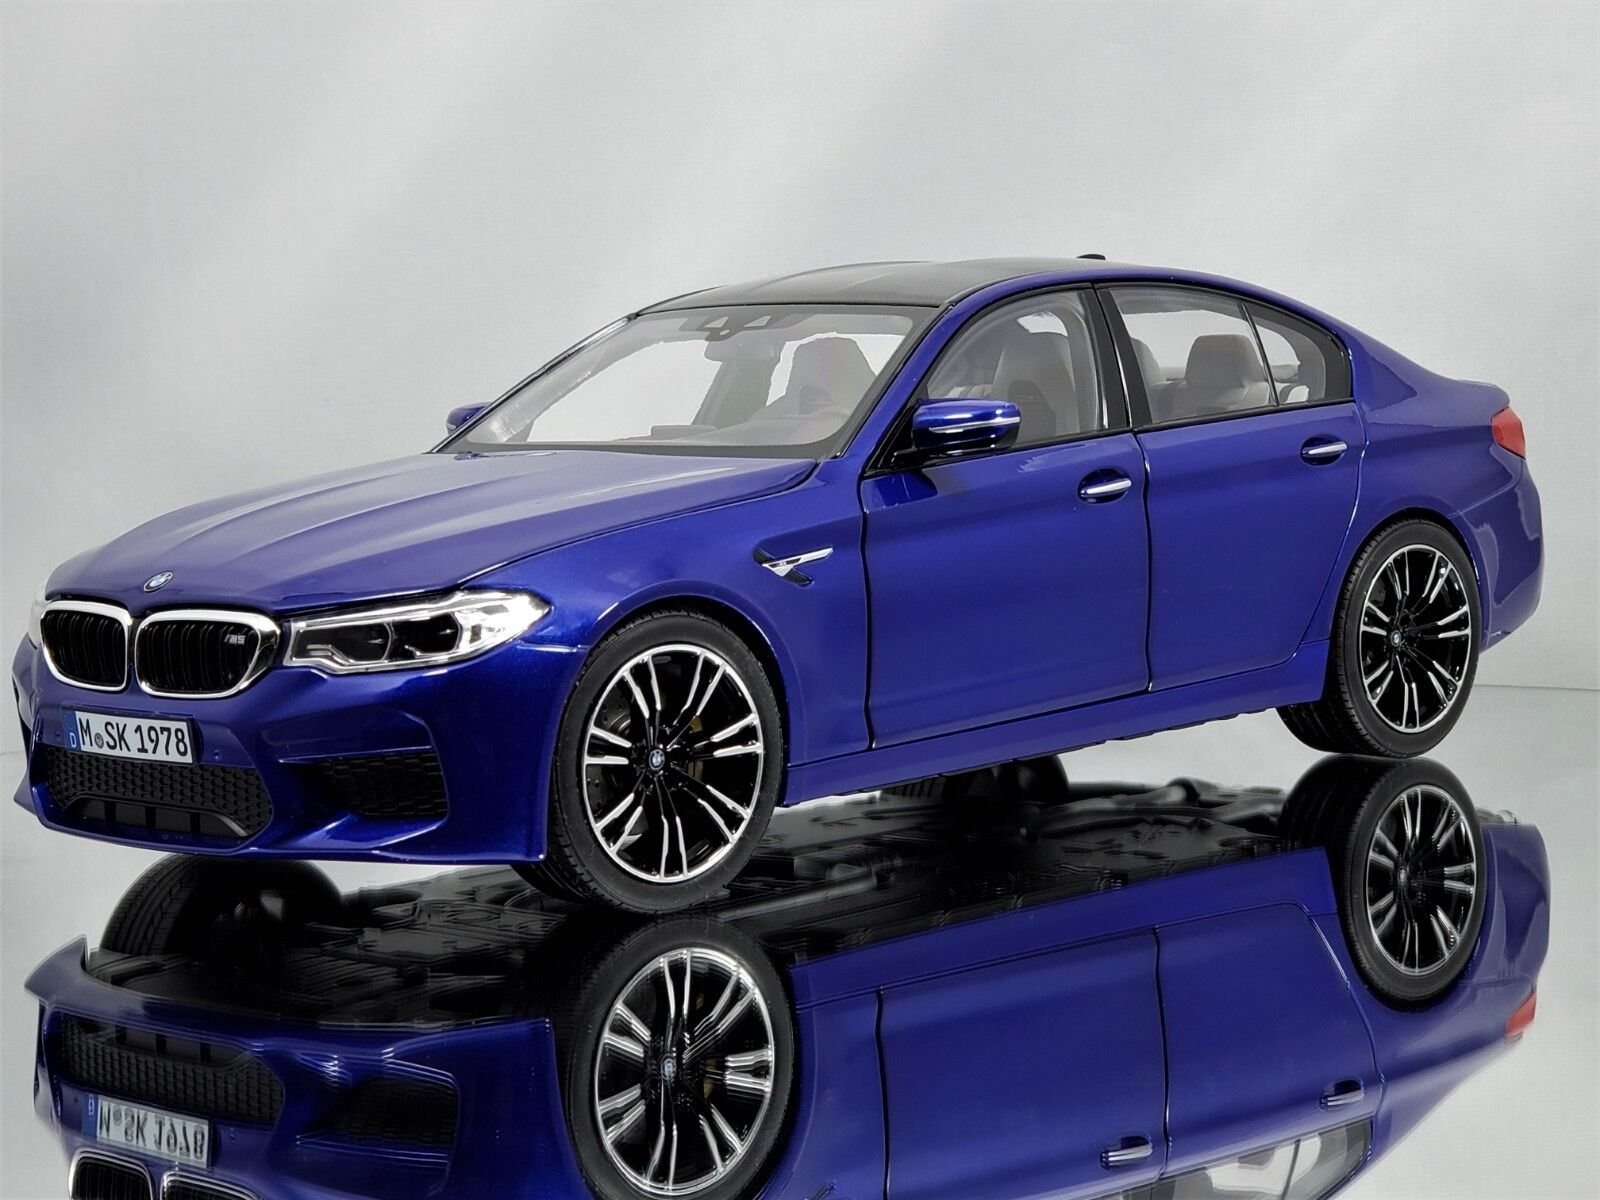 NOREV BMW M5 (F90) Série 5 Berline 2018 Marina Bay bleu Diecast Voiture Modèle 1 18